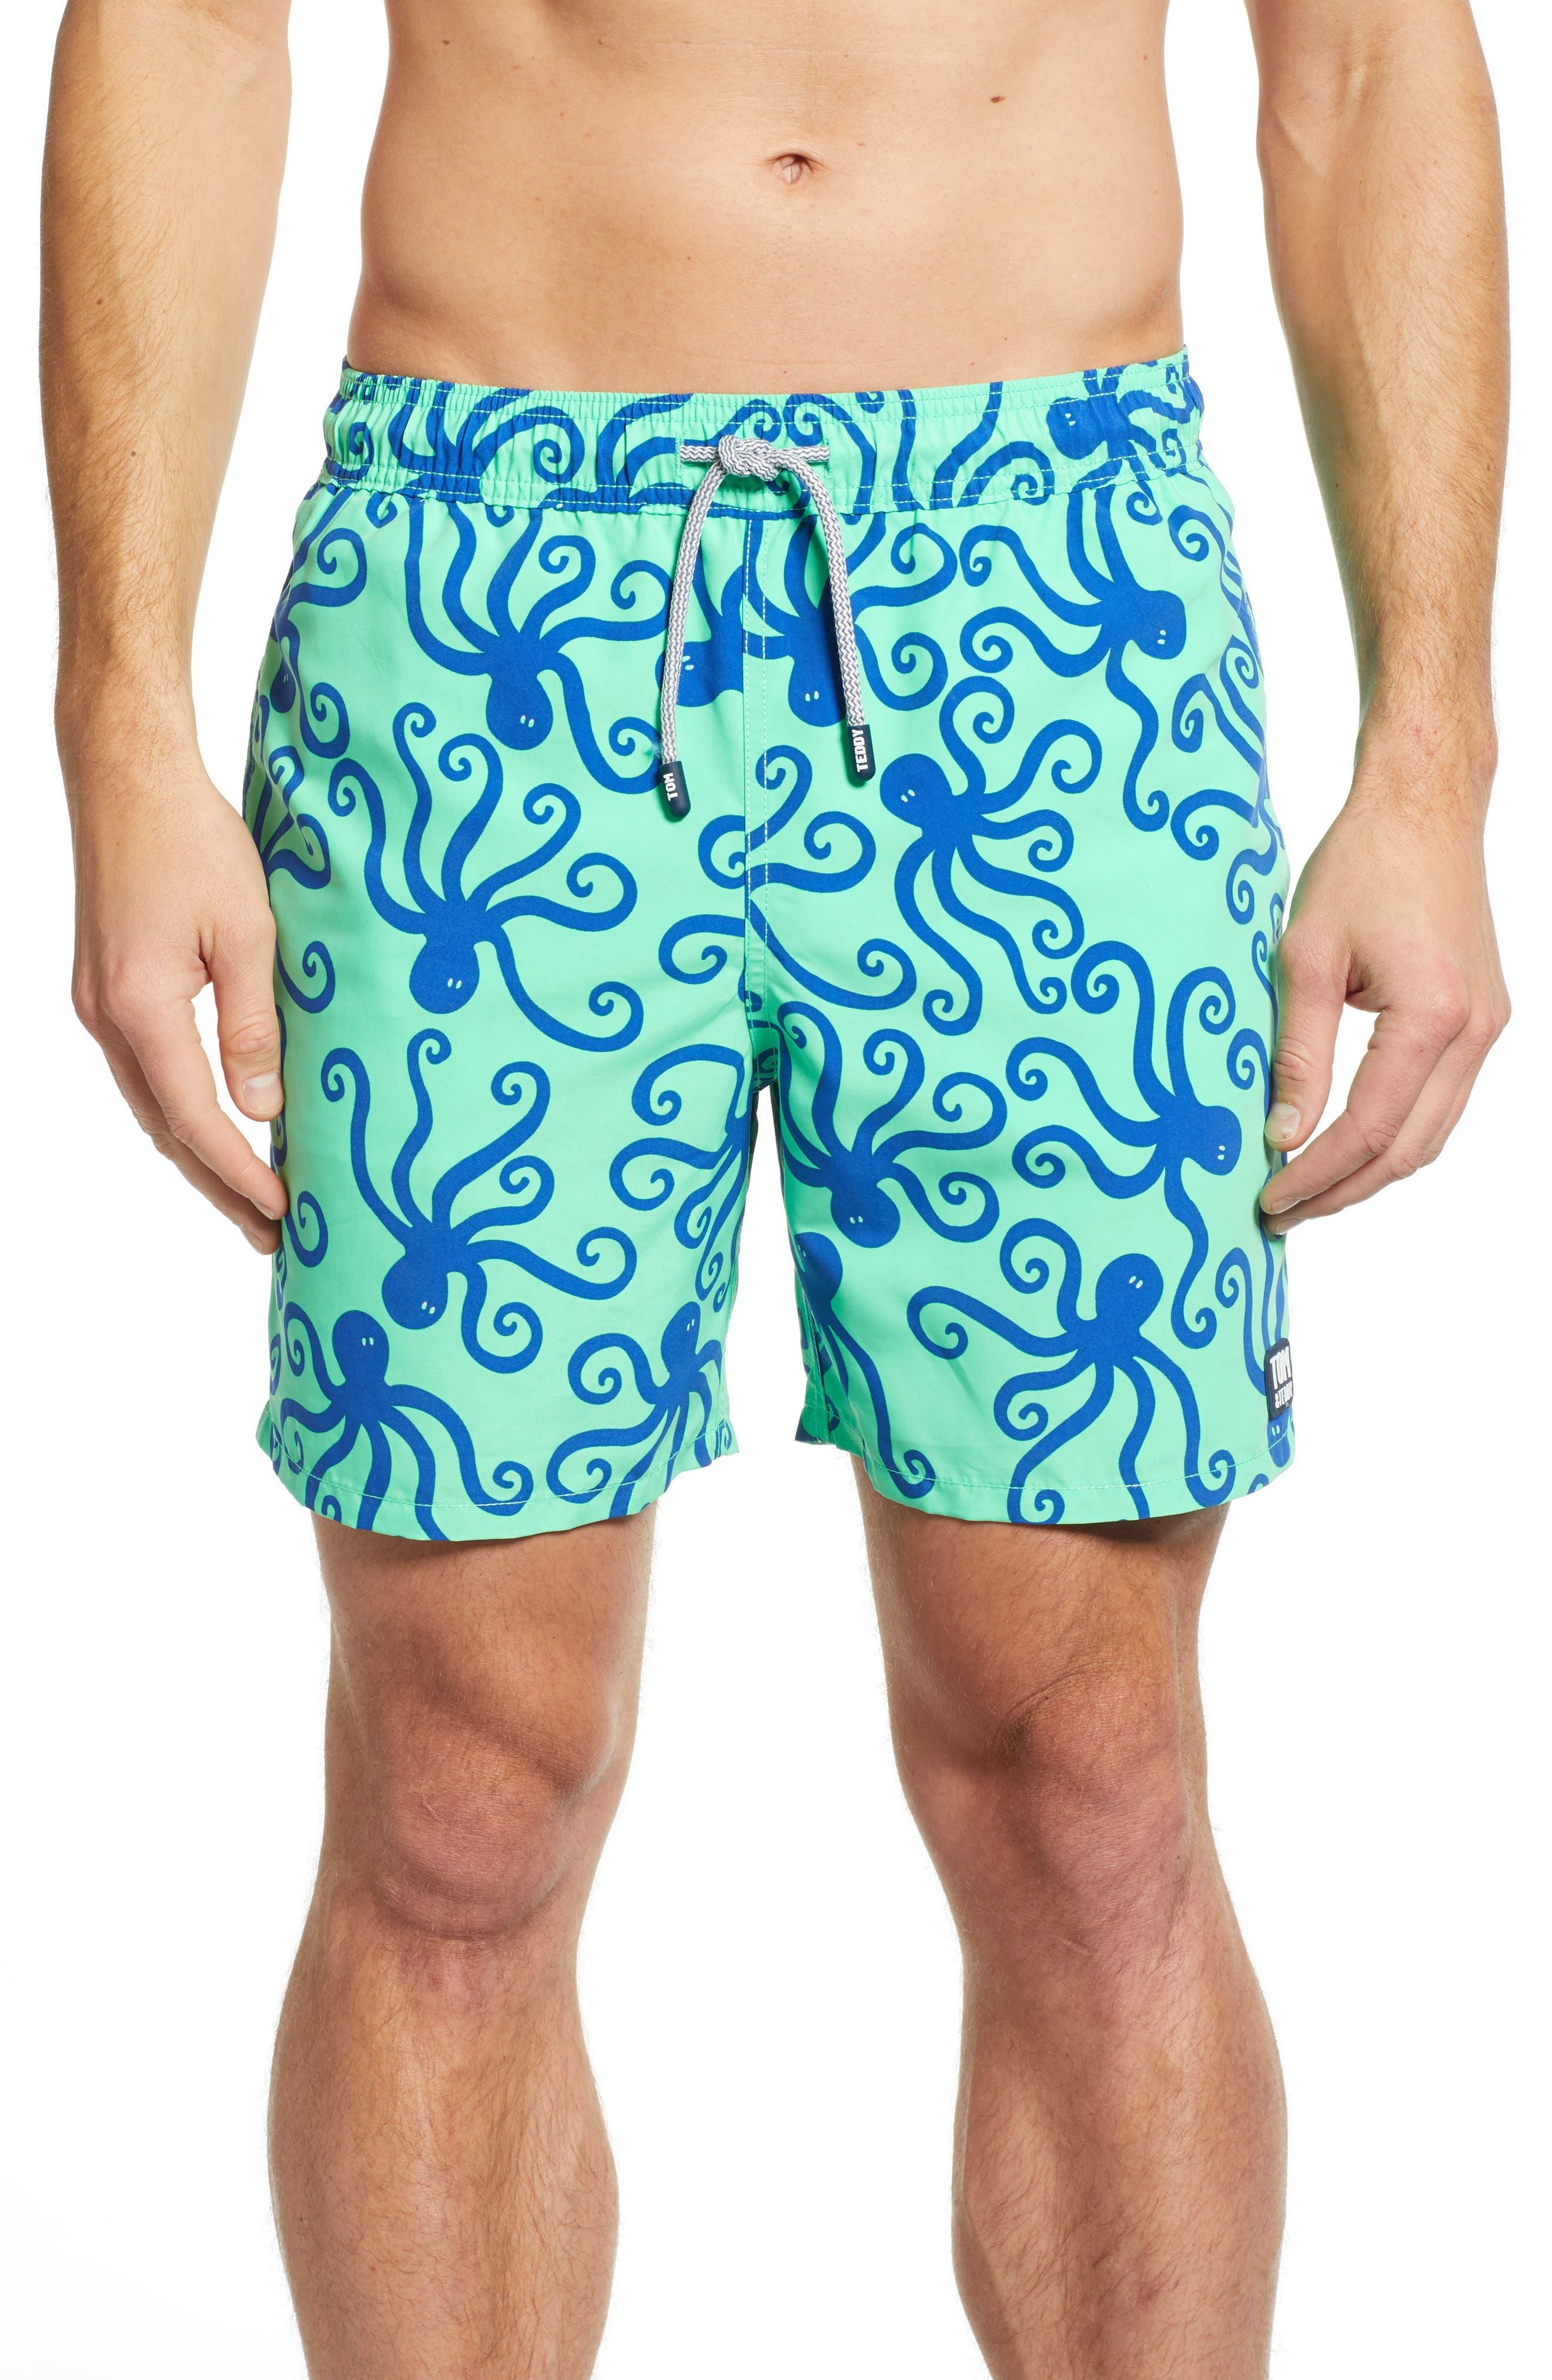 TOM & TEDDY 'Octopus Pattern' Swim Trunks, Main, color, GREEN/ BLUE